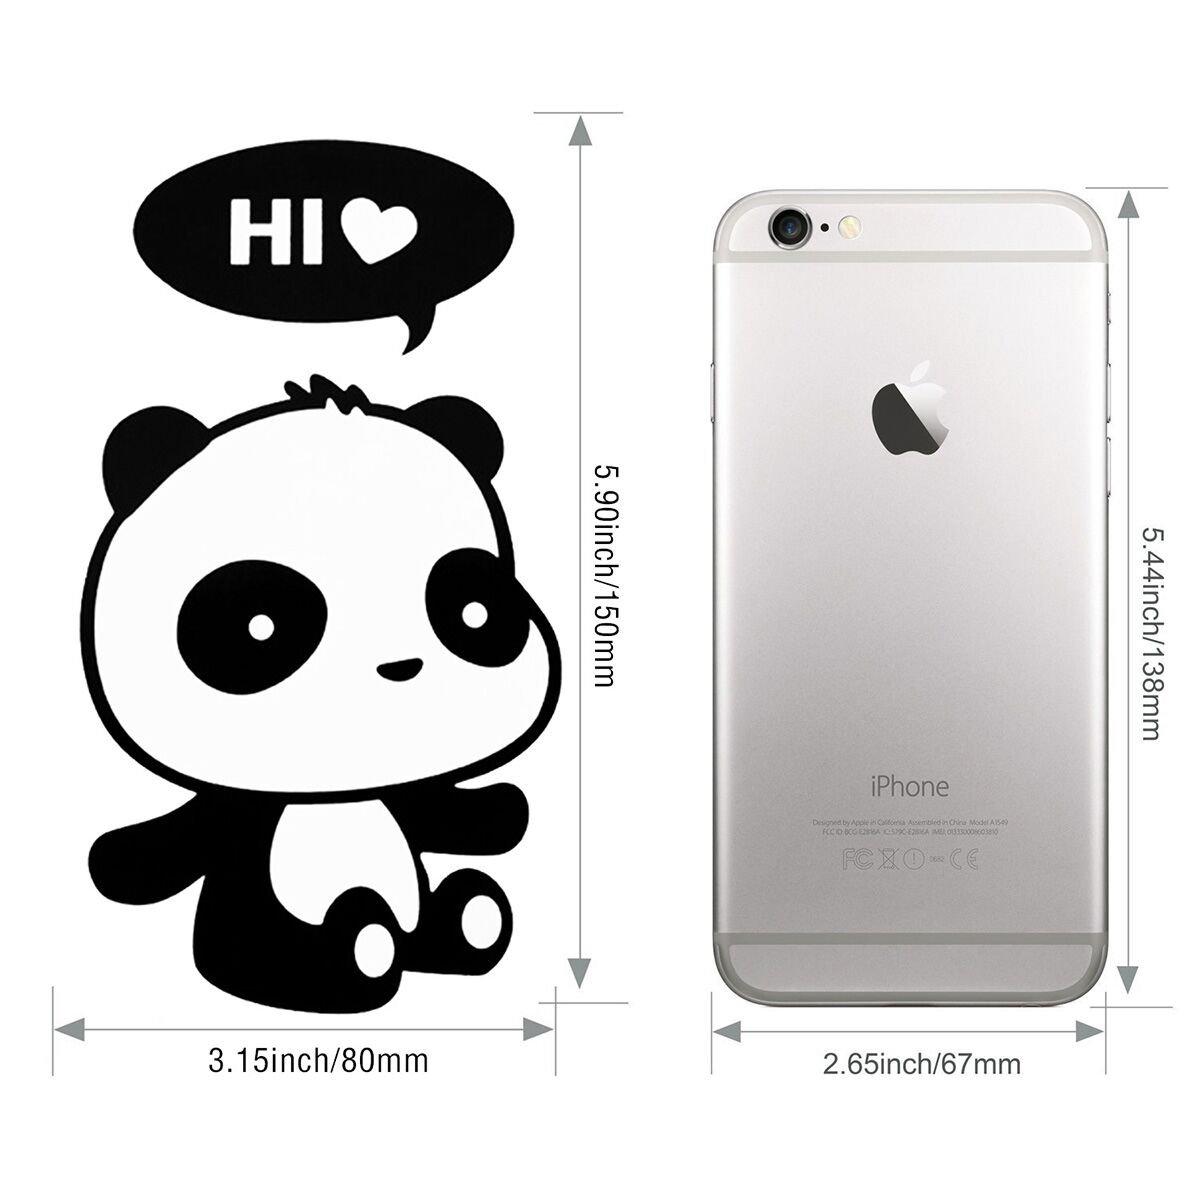 HopMore Pegatinas 6 Piezas Lindo Panda, Stickers para Infantil, Decorativa Pegatina para Pared Maleta Interruptor Macbook Laptop Snowboard Equipaje Coche de ...